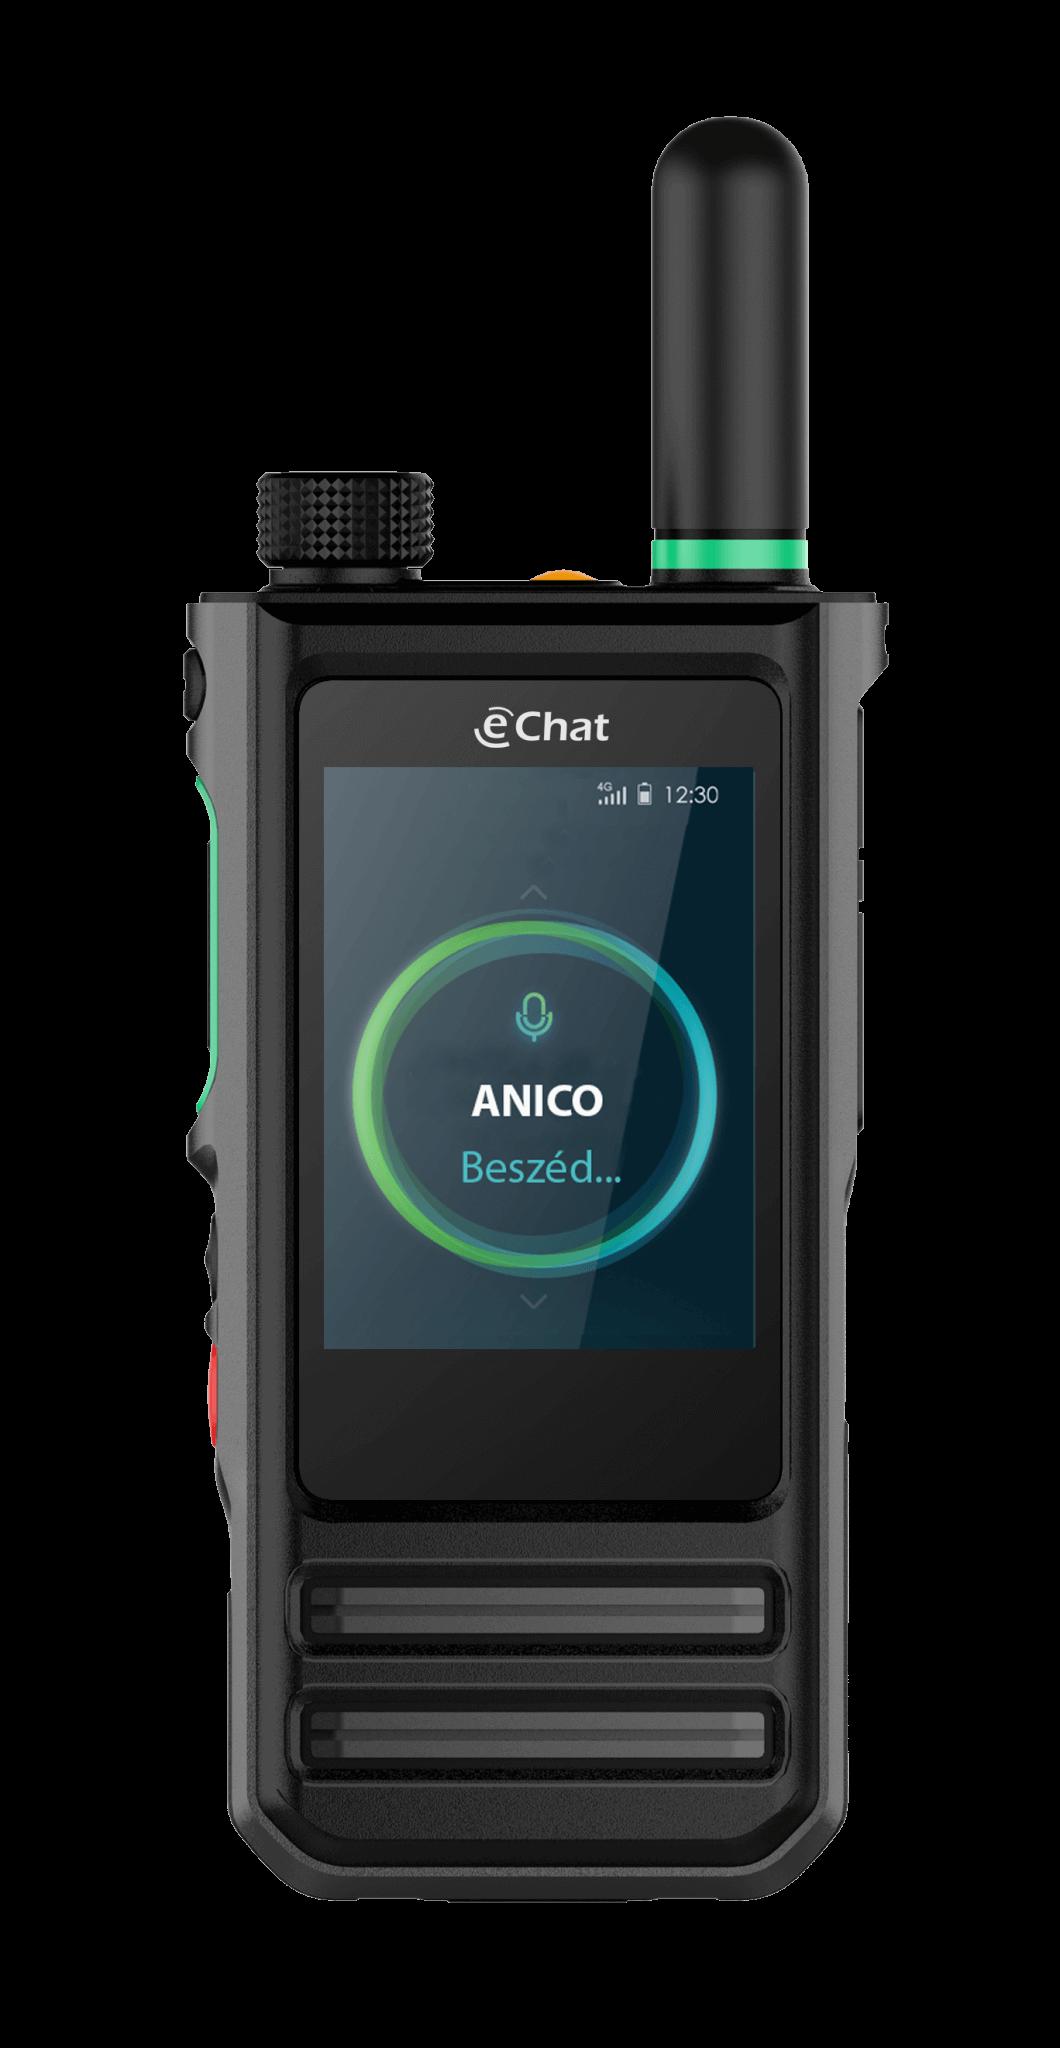 eChat E360 poc internetalapú adóvevő